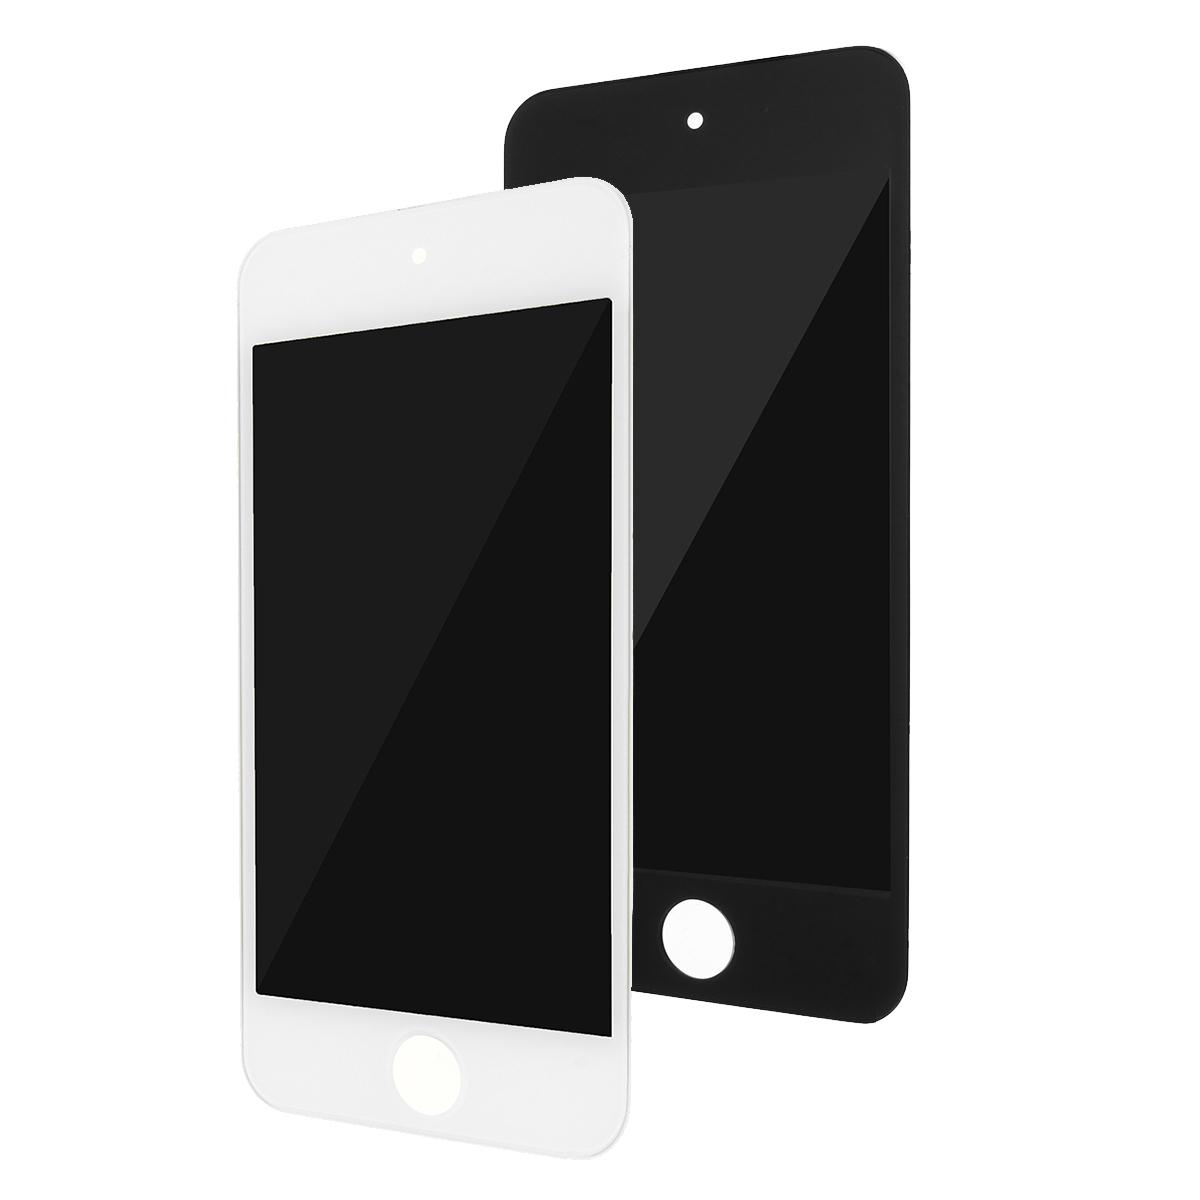 پنل-تاچ-صفحه-نمایش-آیپاد-lcd-display-touch-screen-Apple-iPod-Touch-5th(8).jpg